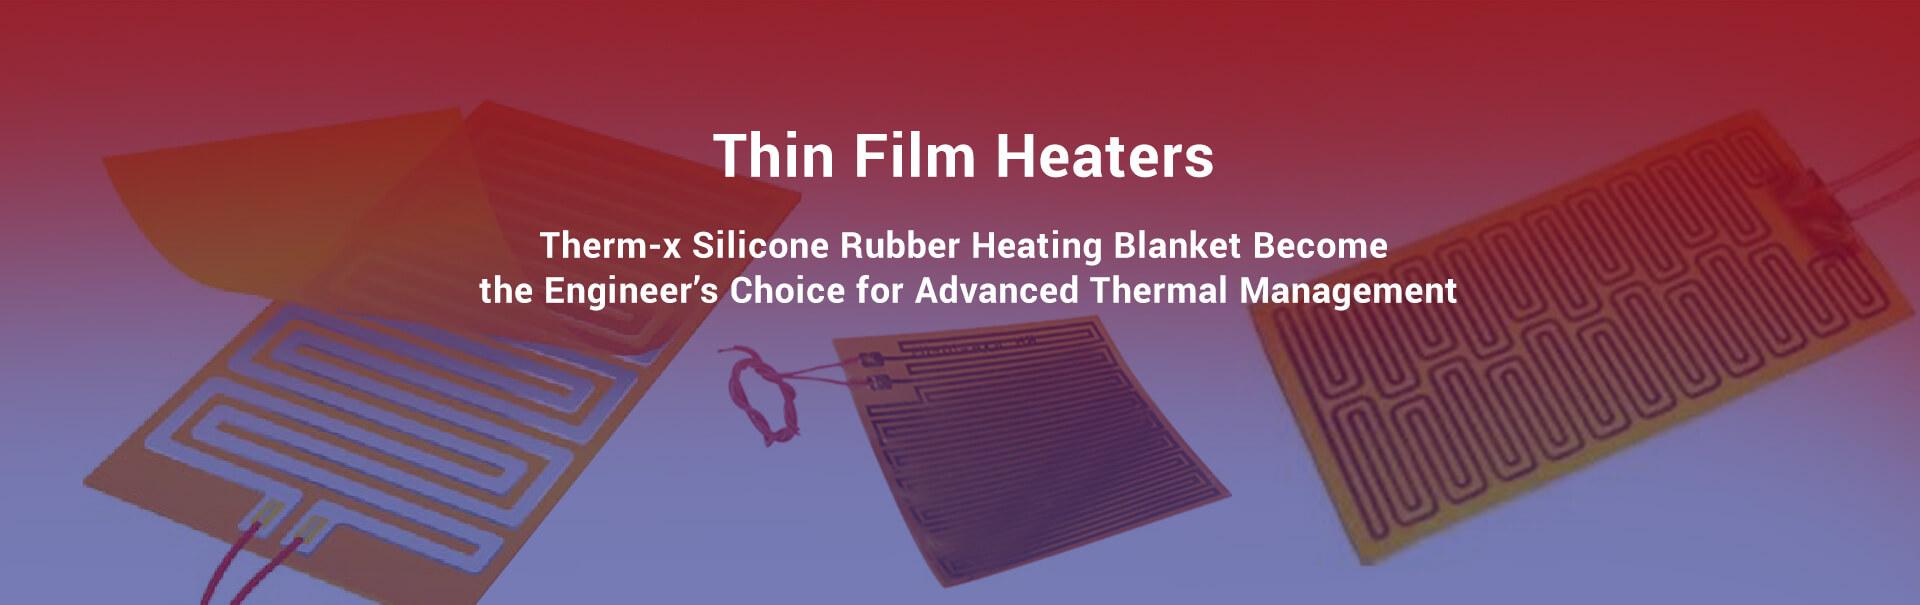 Thin Film Heaters